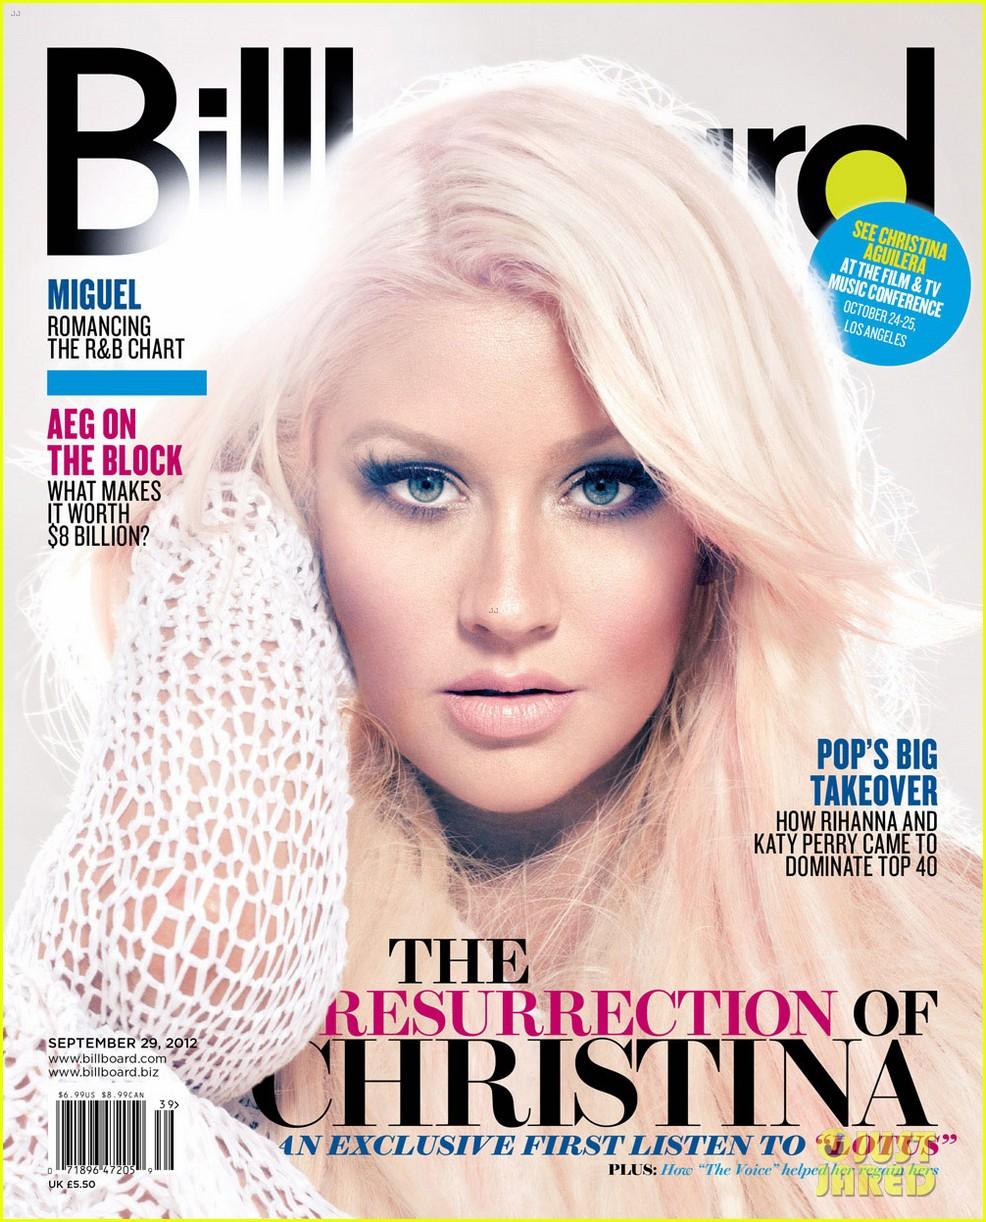 christina aguilera covers billboard magazine